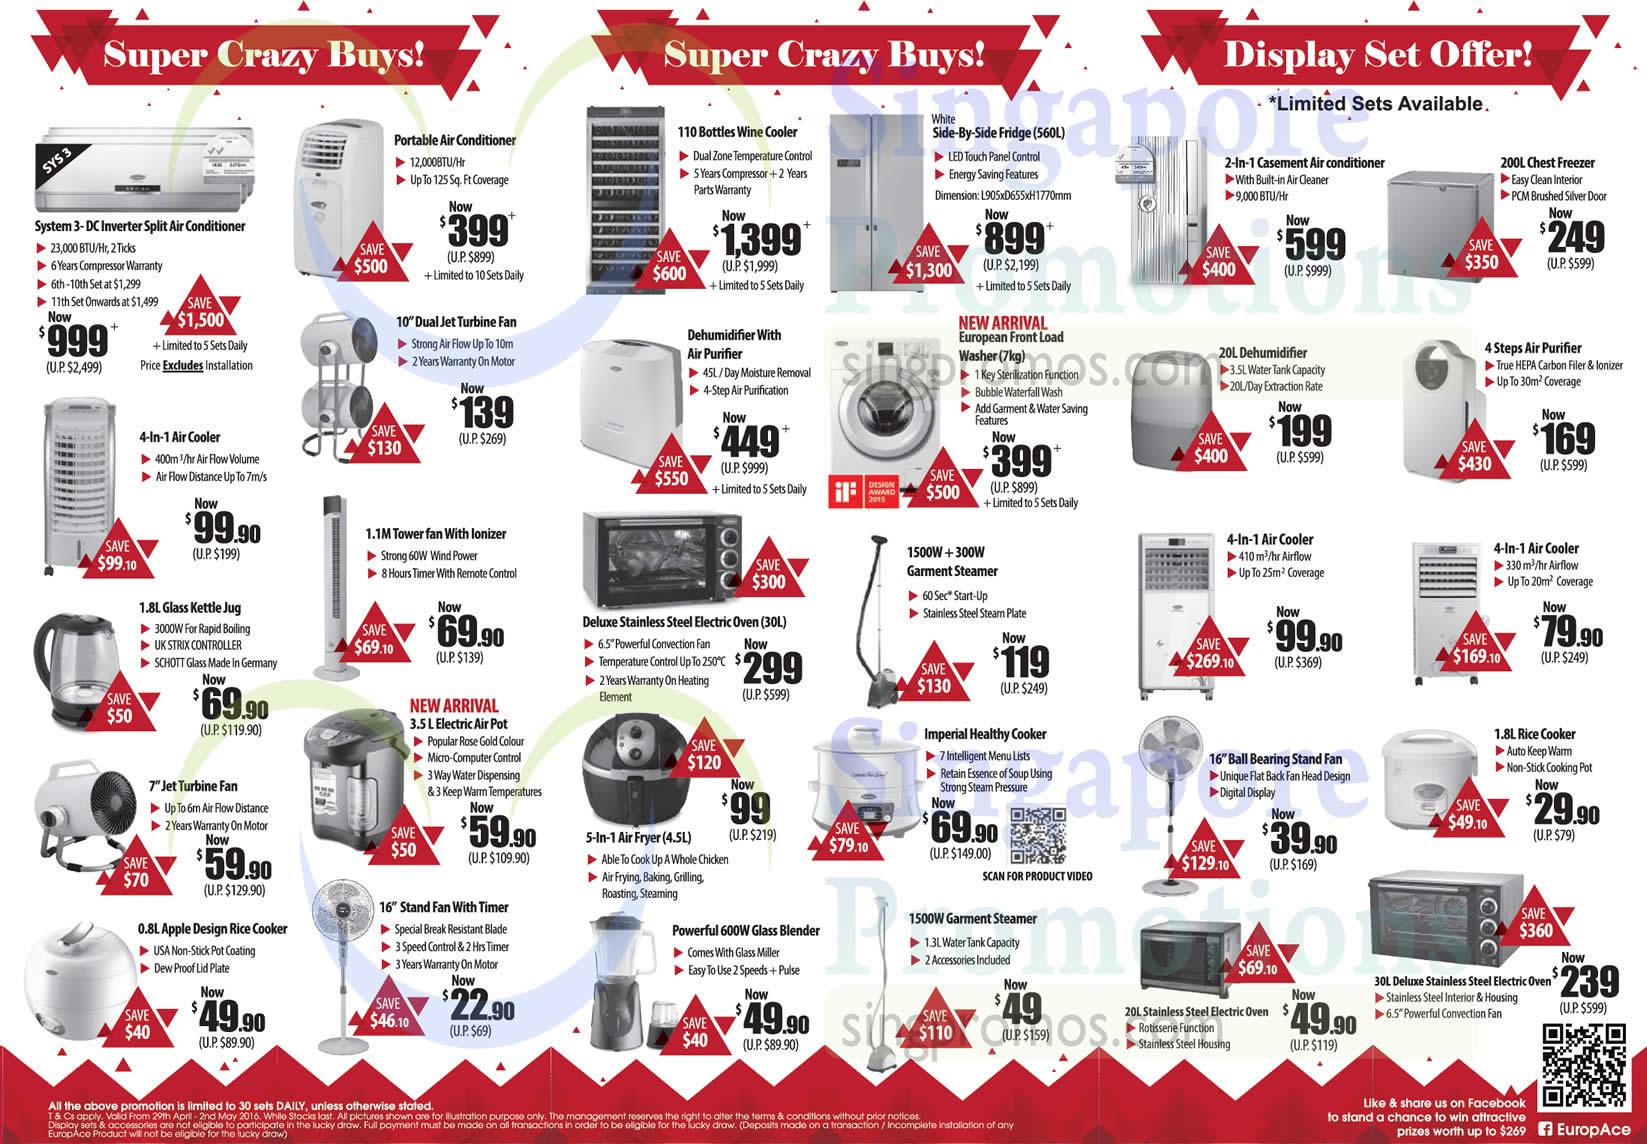 Crazy Buys, Display Sets, Air Condiitoner, Fan, Kettle, Purifier, Air Pot, Air Fryer